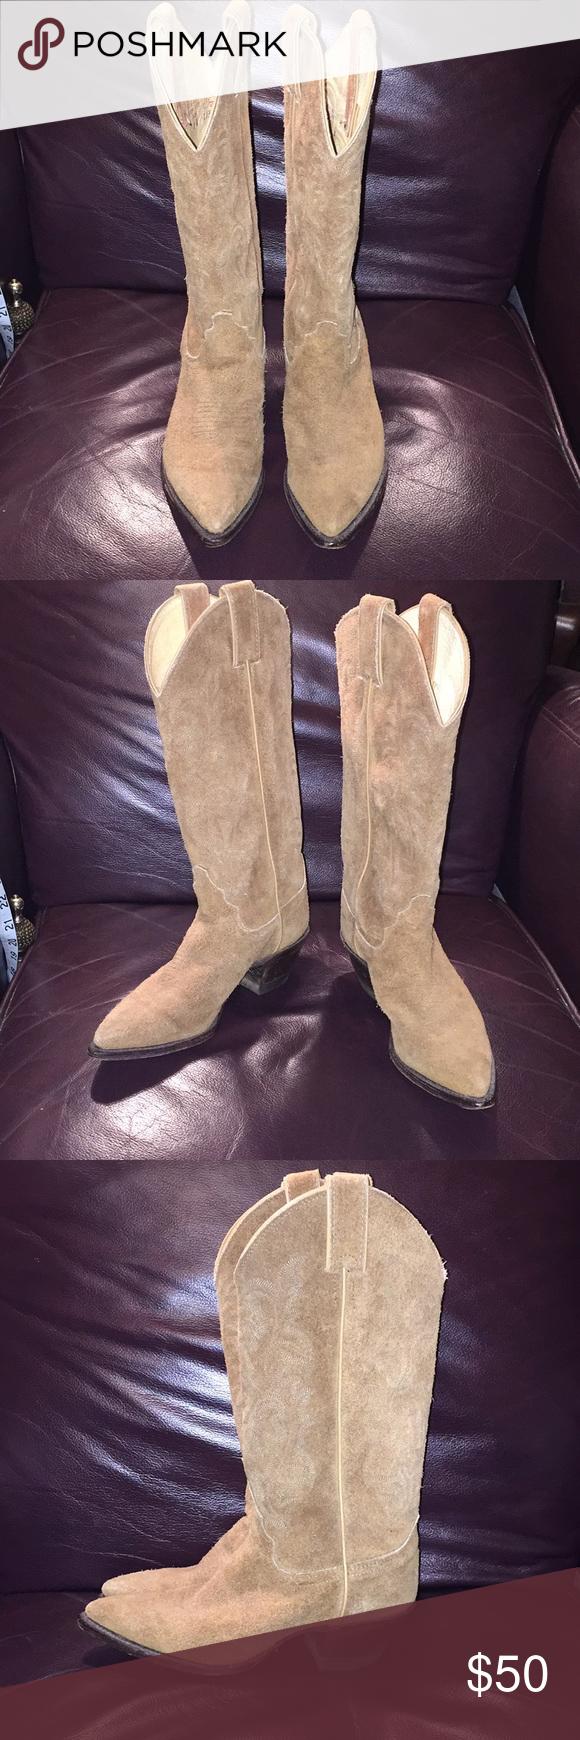 Made Sz 5 B tan suede cowboy boots